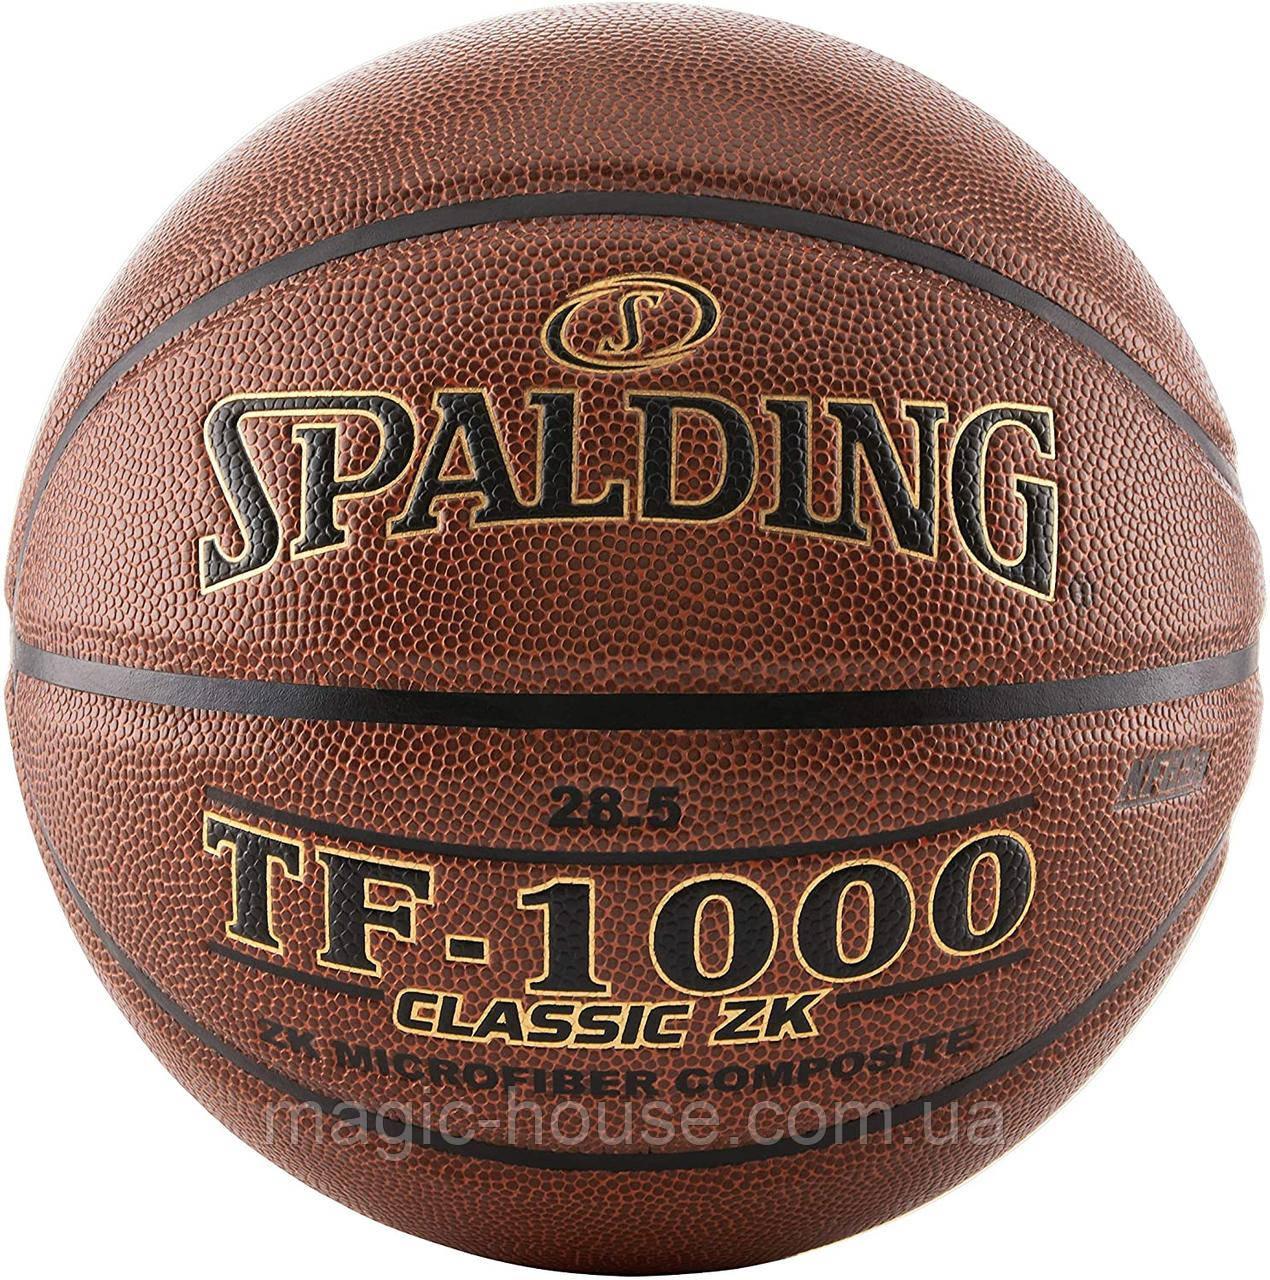 Баскетбольний м'яч спалдінг Spalding TF-1000 Classic ZK Indoor Basketball Game Size 6, 28.5 Оригінал